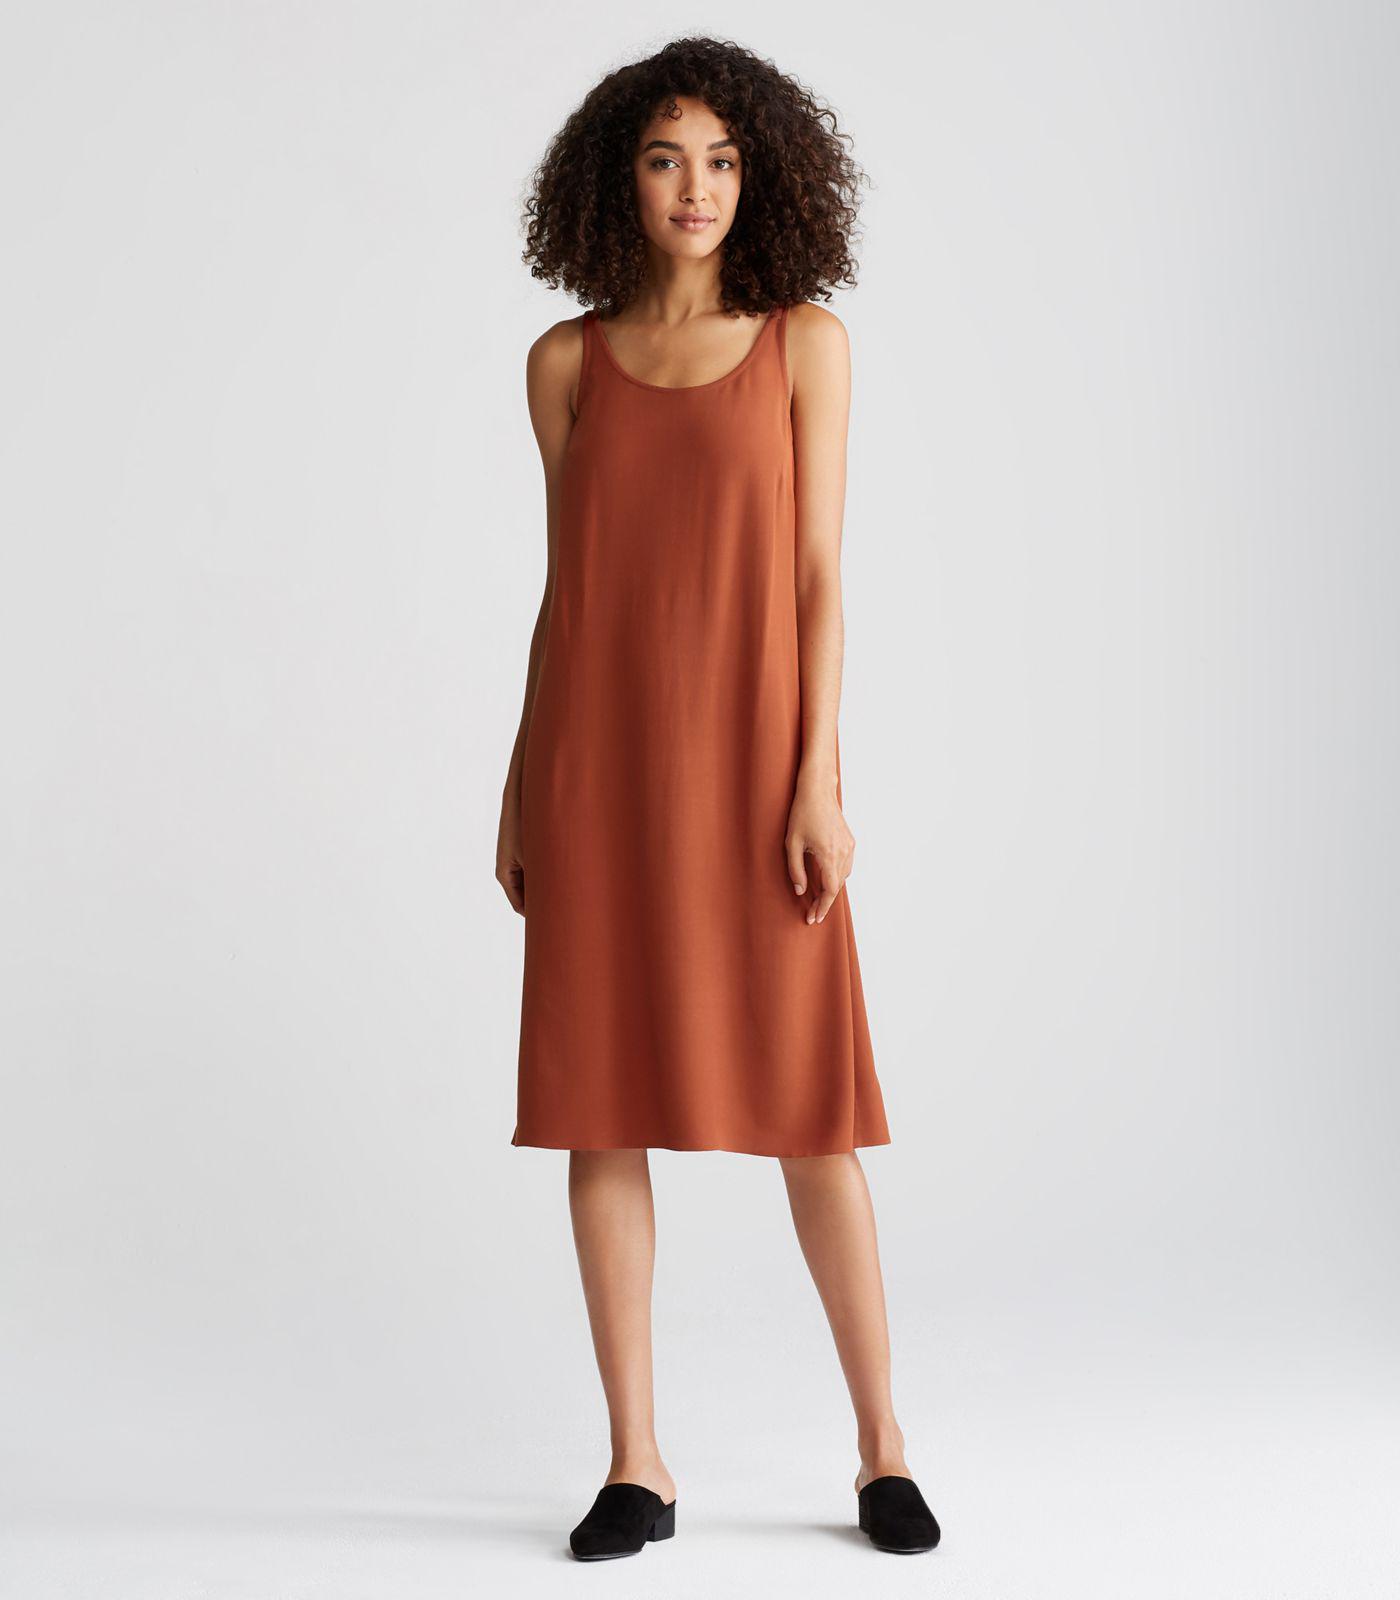 889e25129e Lyst - Eileen Fisher Viscose Crepe Plus Size Slip Dress